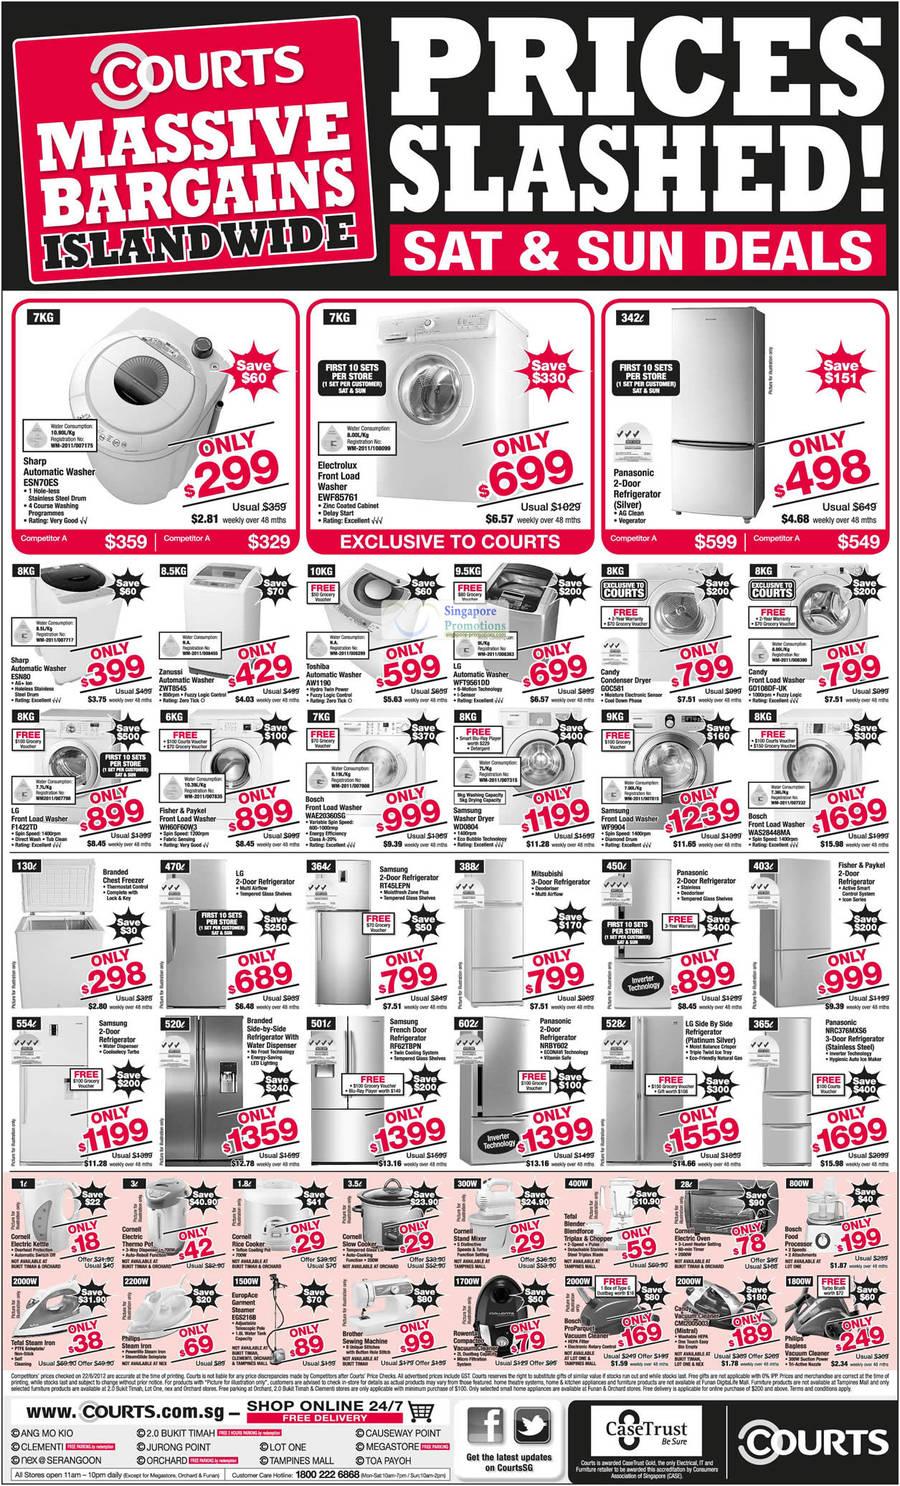 Sharp Washer ESN70ES, Electrolux Washer EWF85761, Sharp Washer ESN80, Zanussi Washer ZWT8545, Toshiba Washer AW1190, LG Washer WFT9561DD, Candy Dryer GOC581, Candy Washer GO108DF-UK, Bosch Washer WAS28448MA, Samsung Washer WF9904, Samsung Washer WD0804, Bosch Washer WAE20360SG, Fisher & Paykel Washer WH60F60W3, LG Washer F1422TD, Samsung Fridge RT45LEPN, Samsung Fridge RF62TBPN, Panasonic Fridge NRBY602, Panasonic NRC376MXS6 Fridge, Candy Vacuum Cleaner CMI2005003 Mistral, Europace Garment Steamer EGS216B